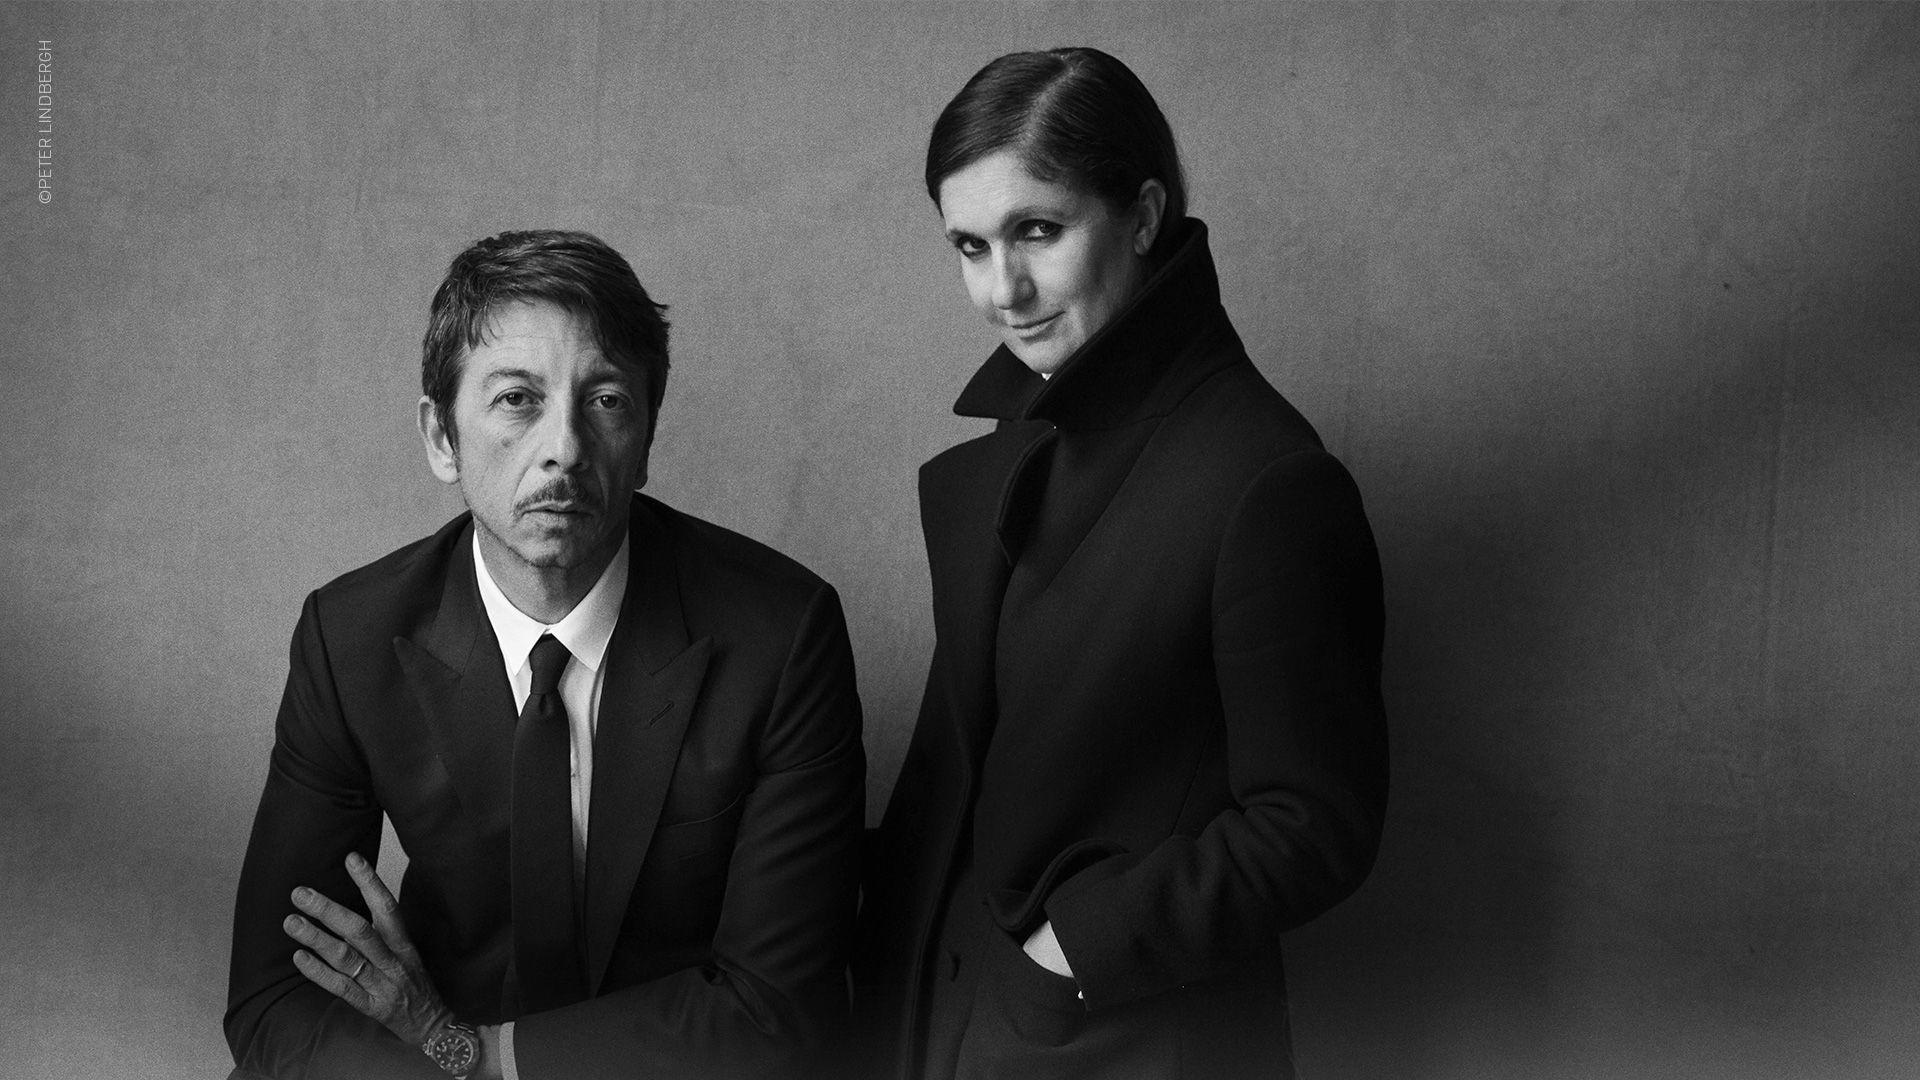 Creative Directors Maria Grazia Chiuri and Pierpoalo Piccioli proud winners of the 2015 CFDA International Award.